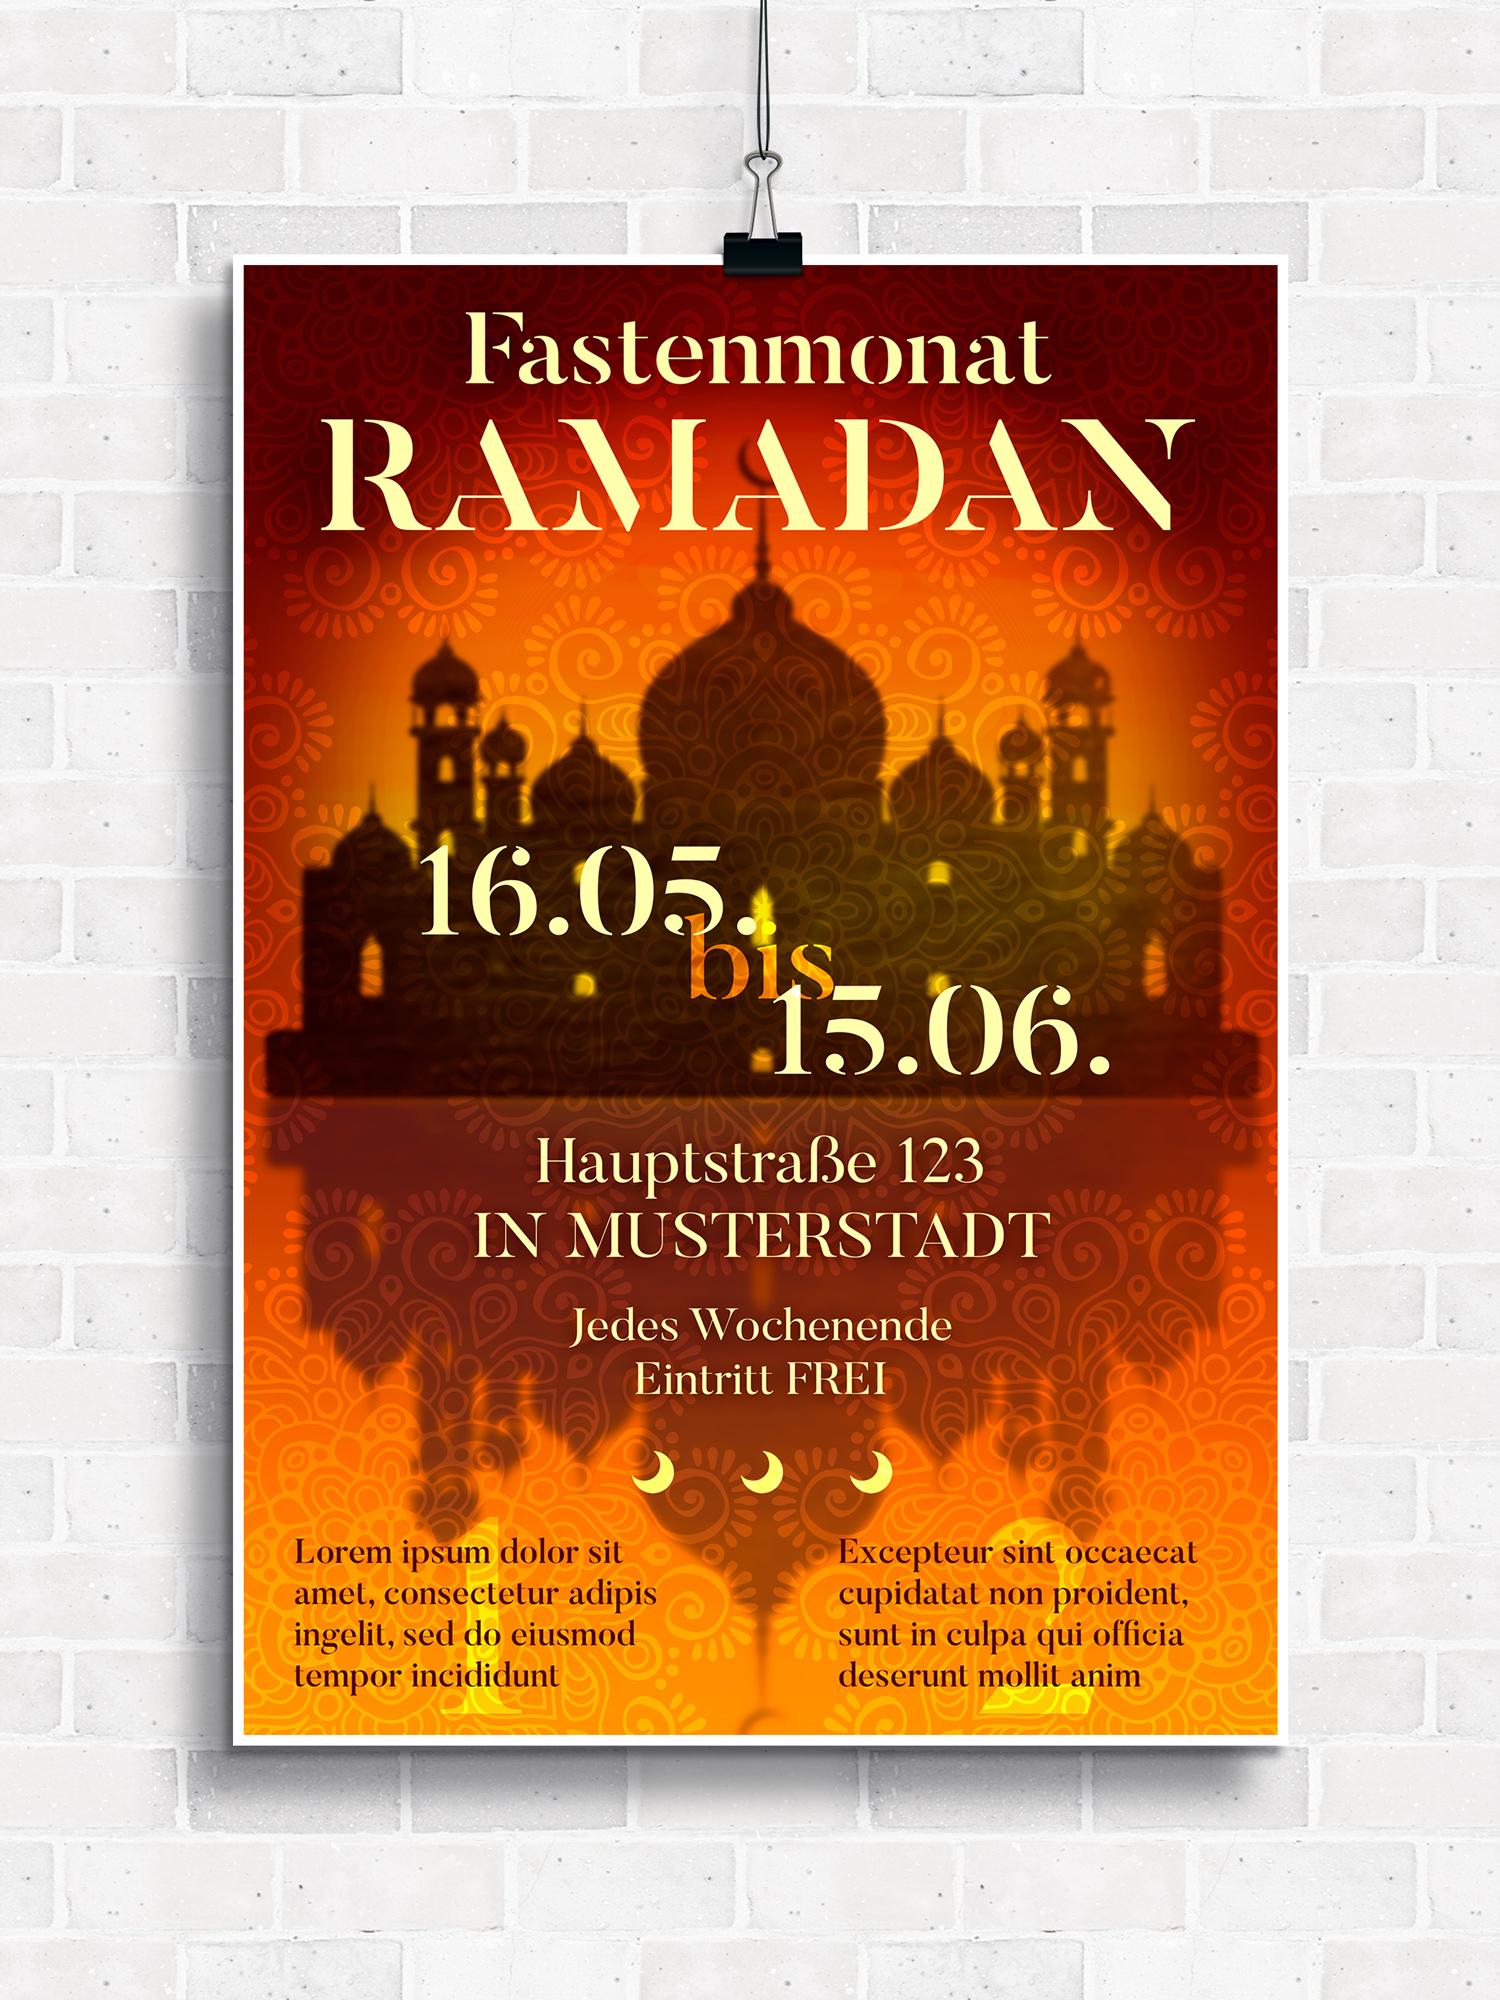 Plakat für Ramadan